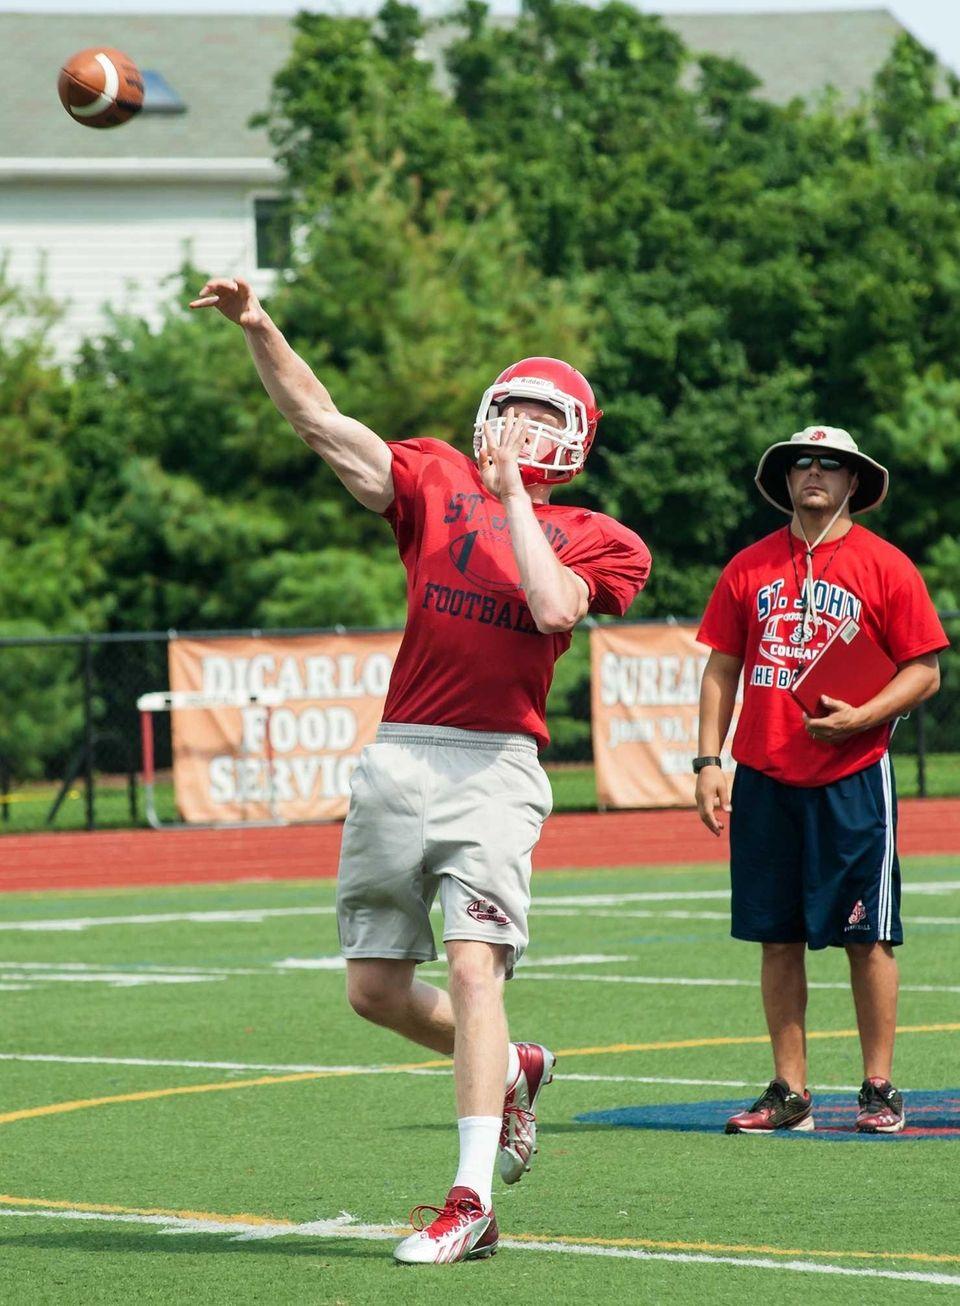 Saint John the Baptist's Matt Brady throws a